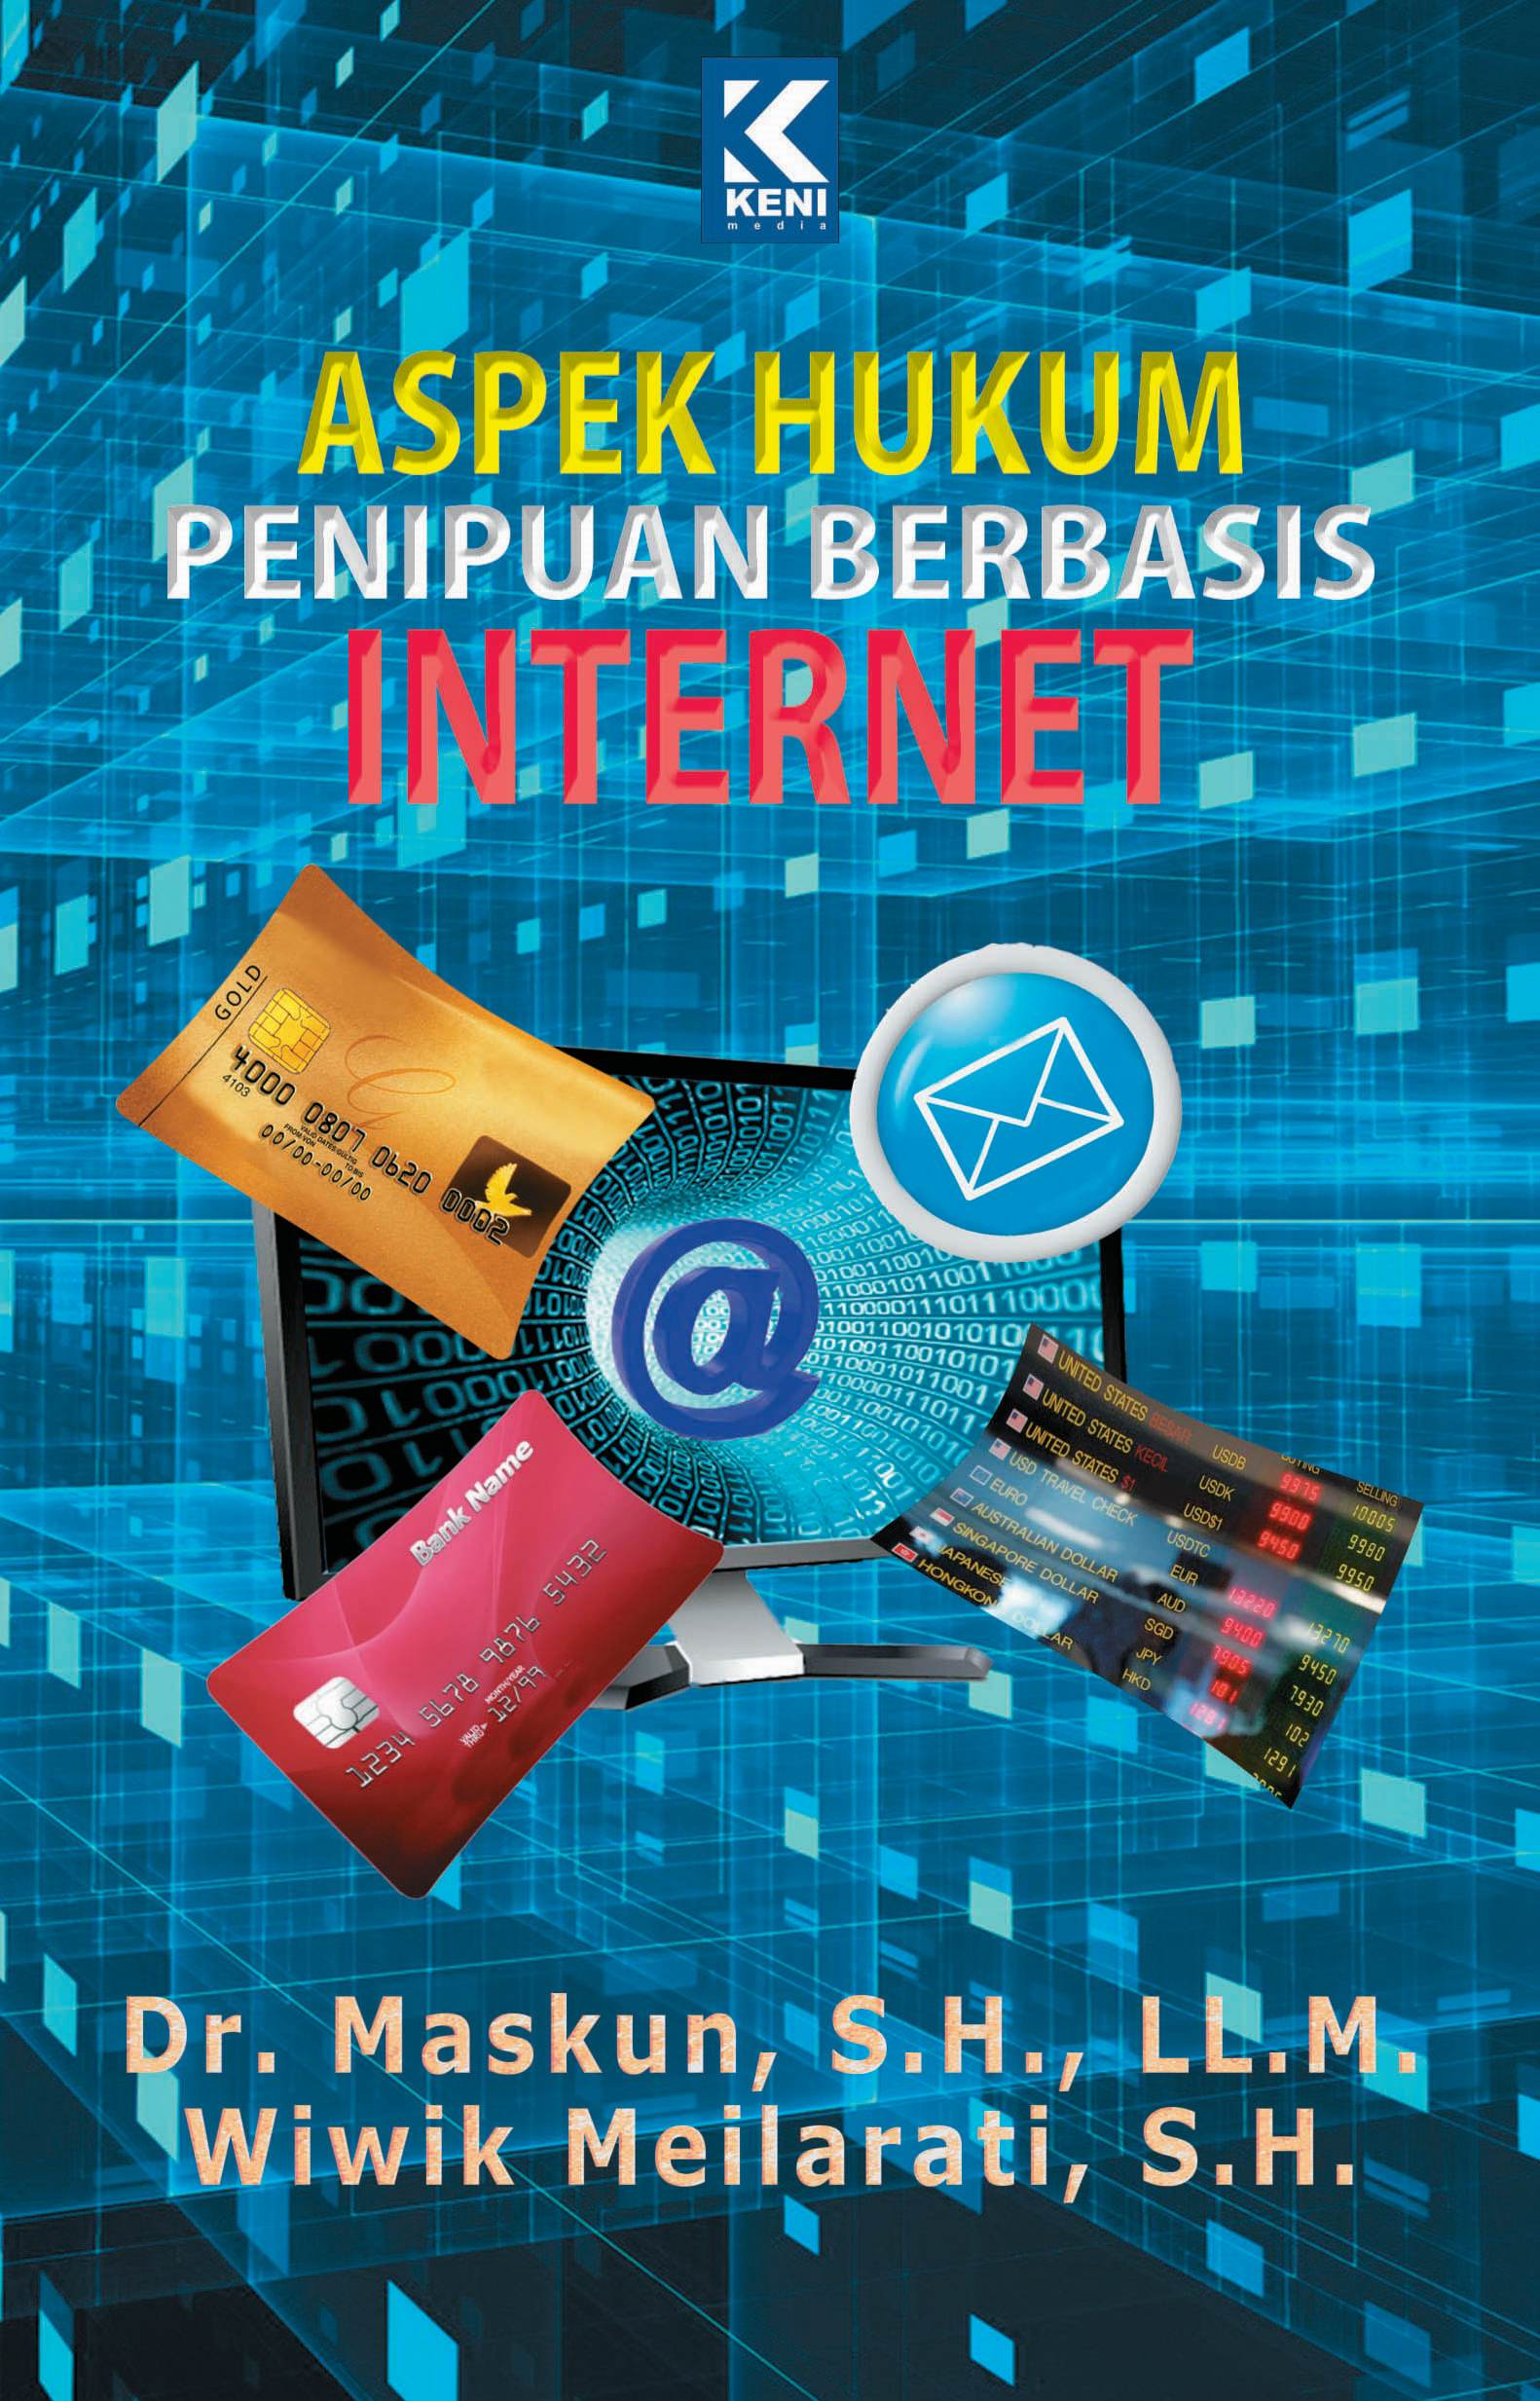 Aspek Hukum Penipuan Berbasis Internet Keni Media